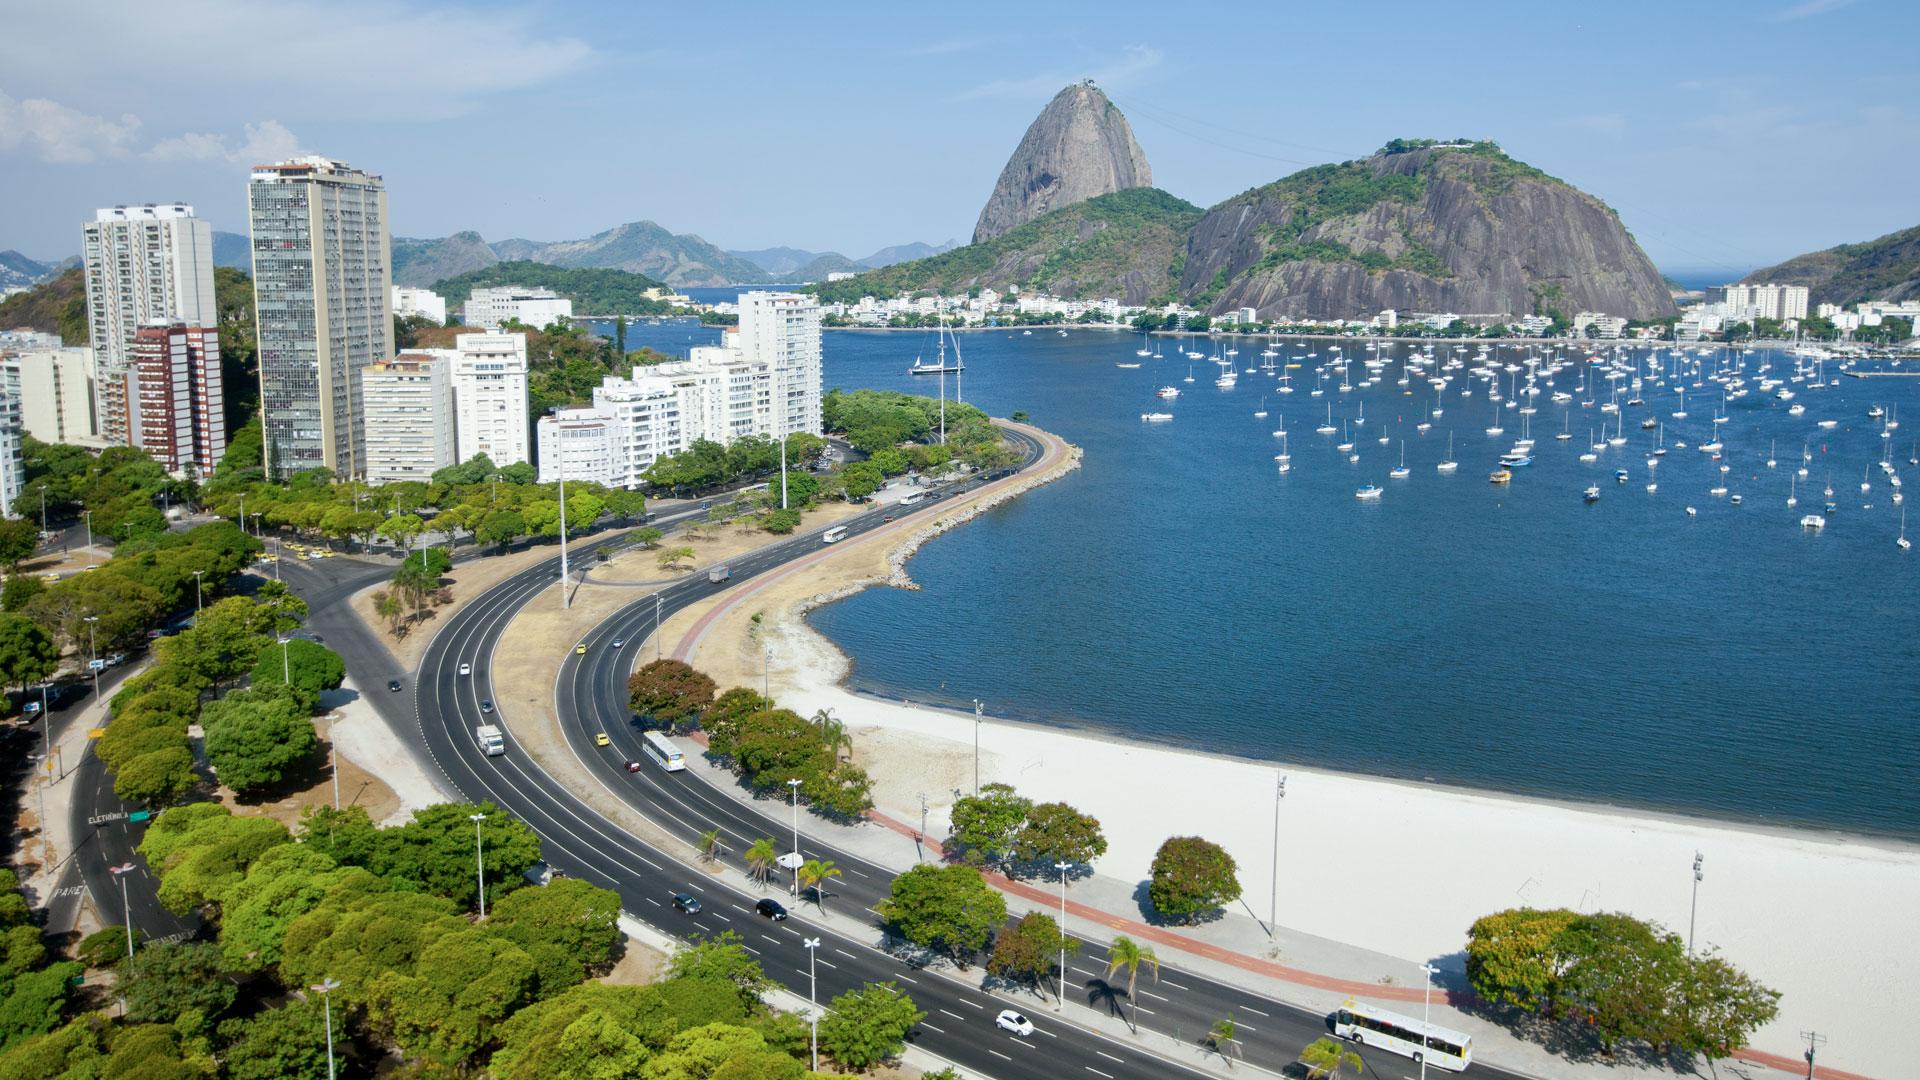 Brazil Wintershall Dea GmbH